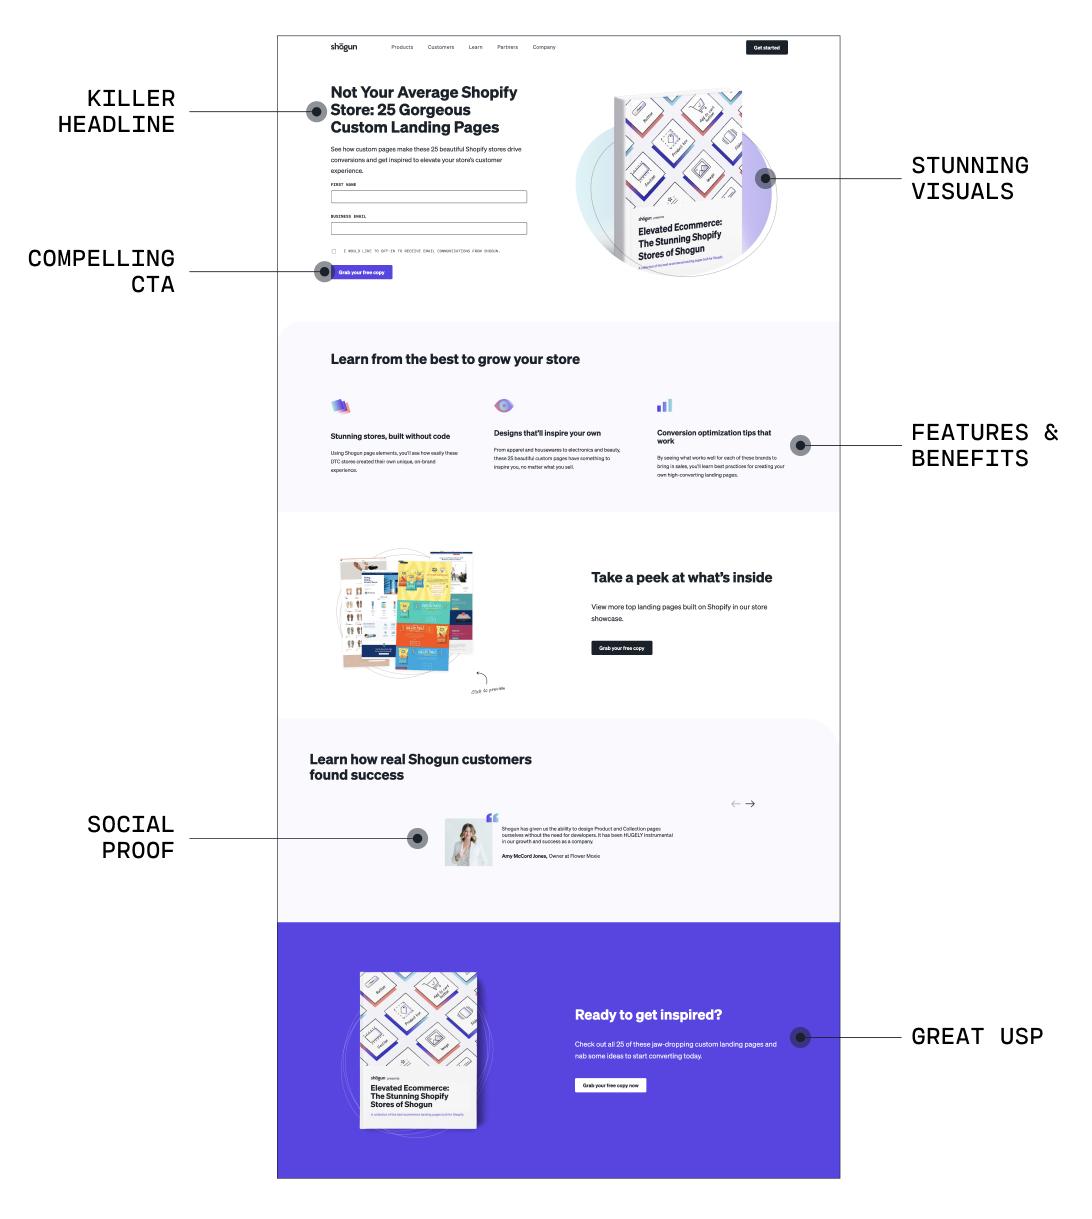 shogun ebook landing page elements for conversion